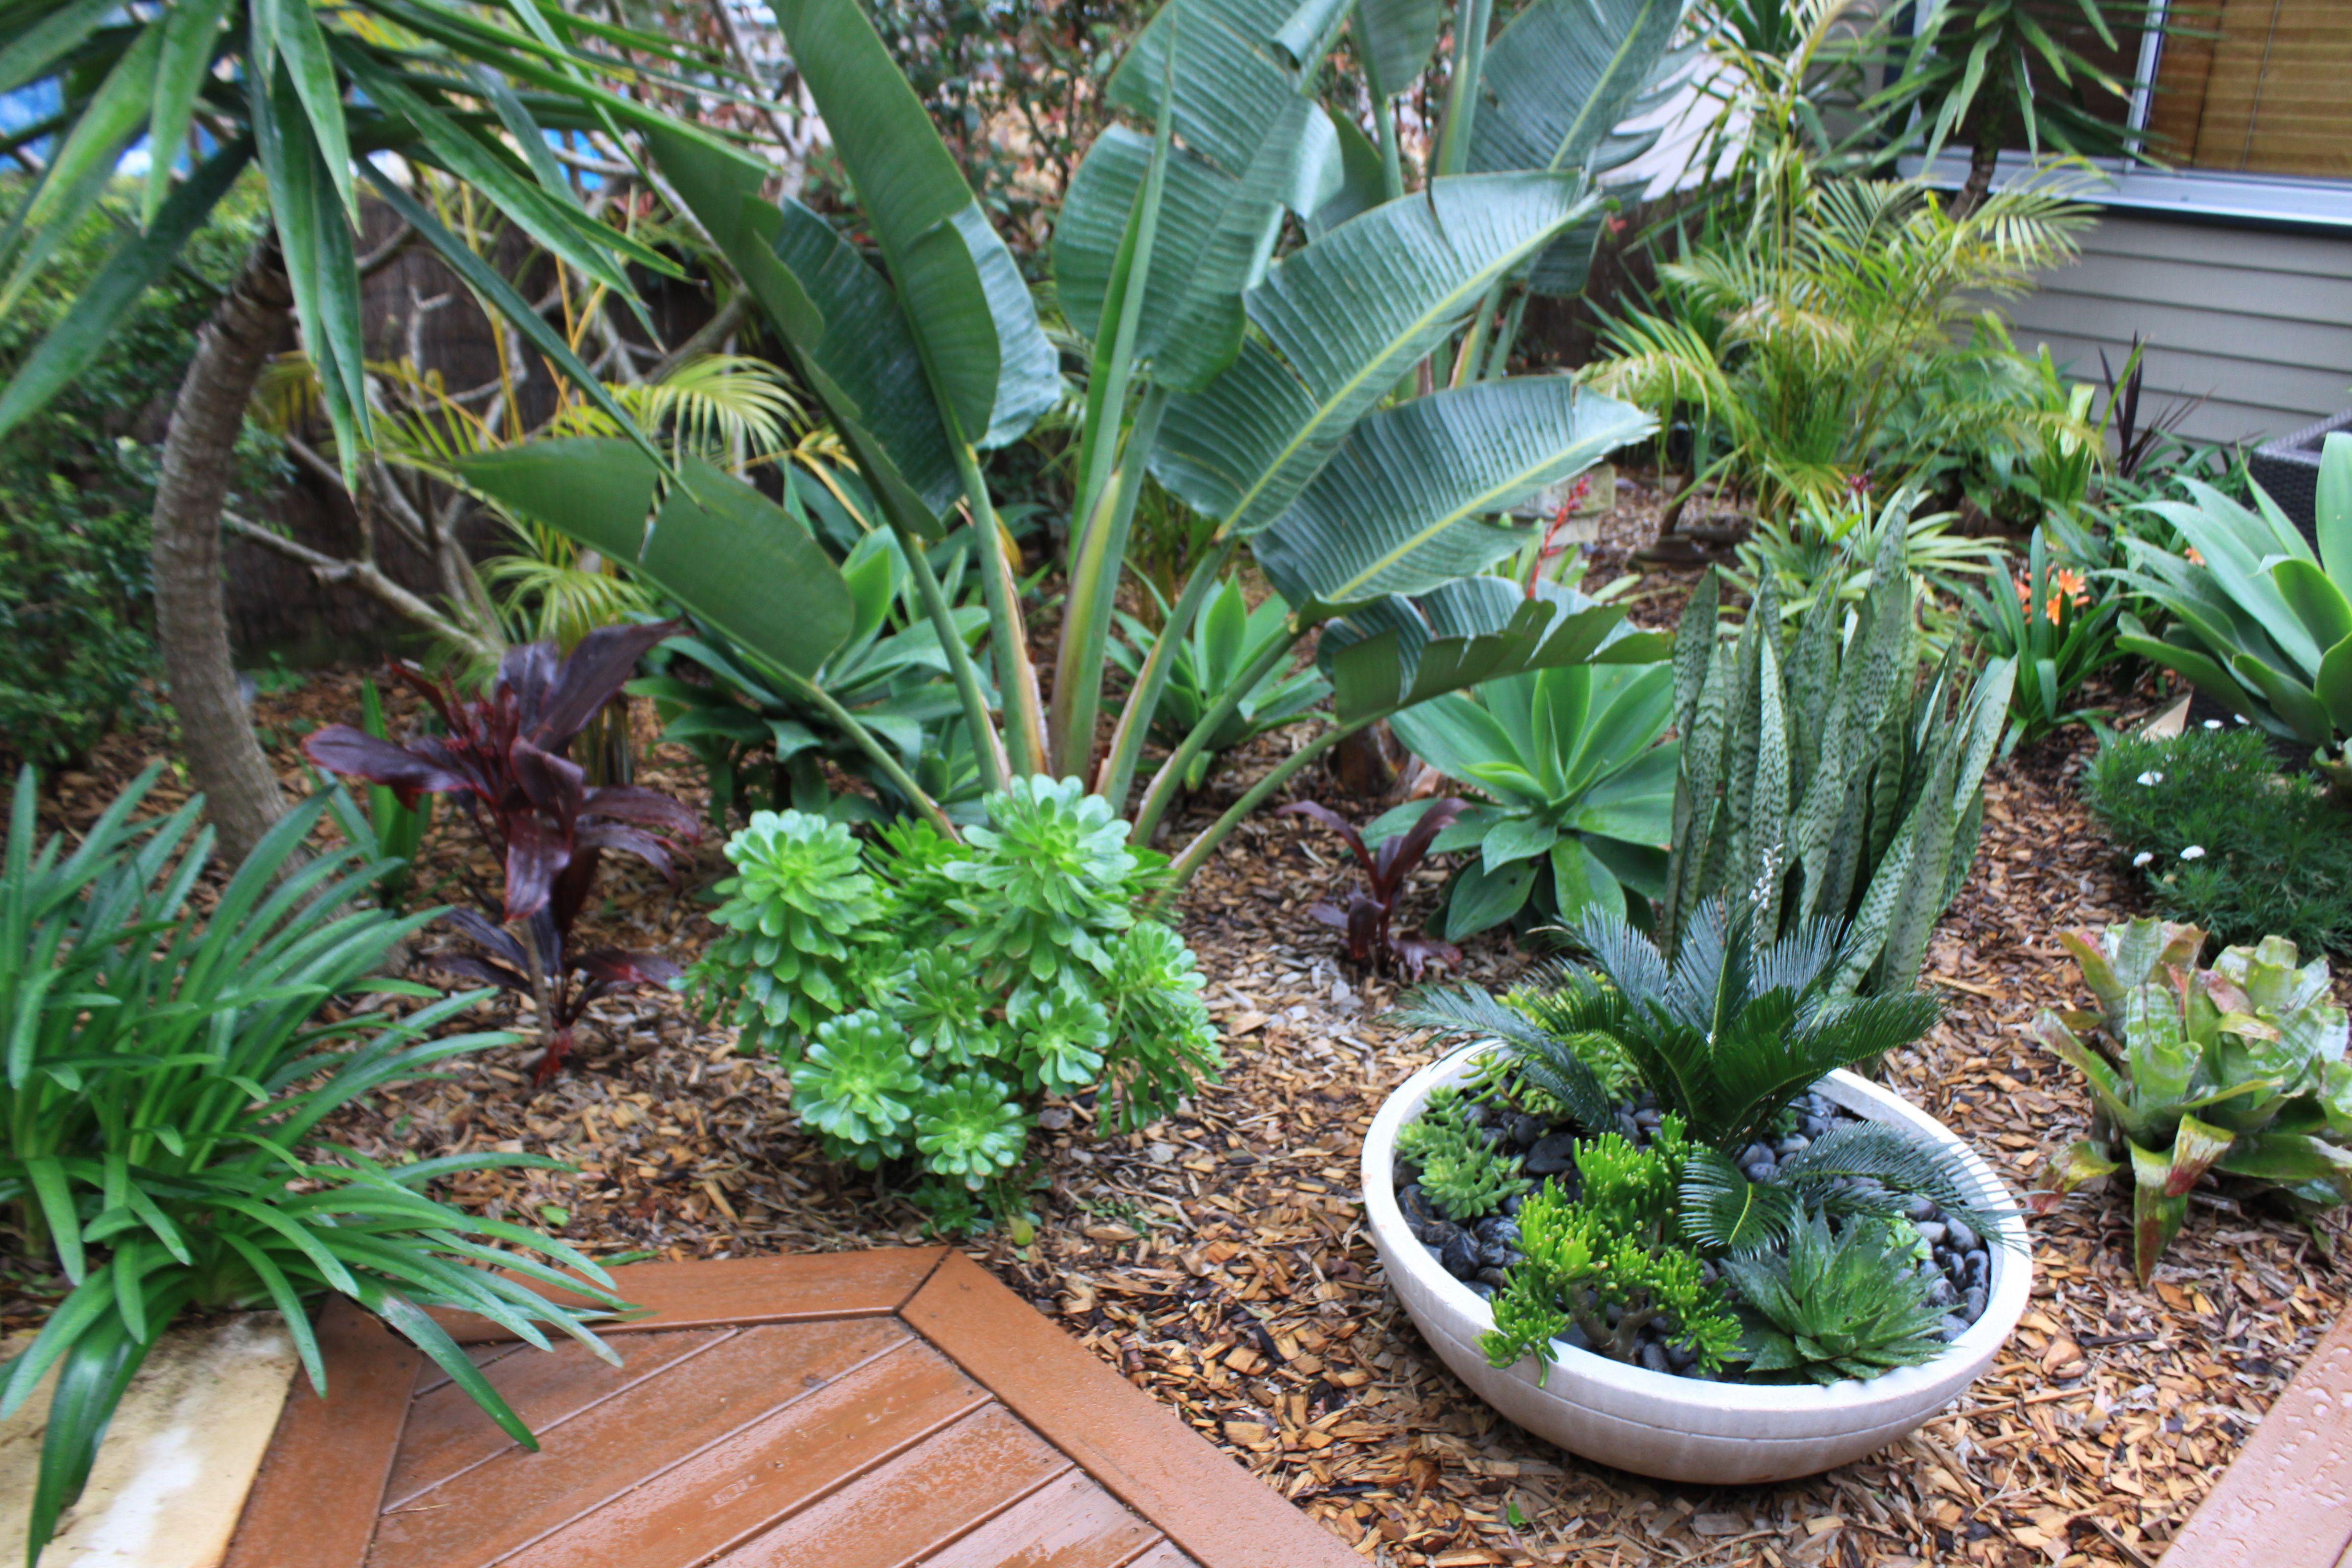 2015 Entry - Spring Garden Competition